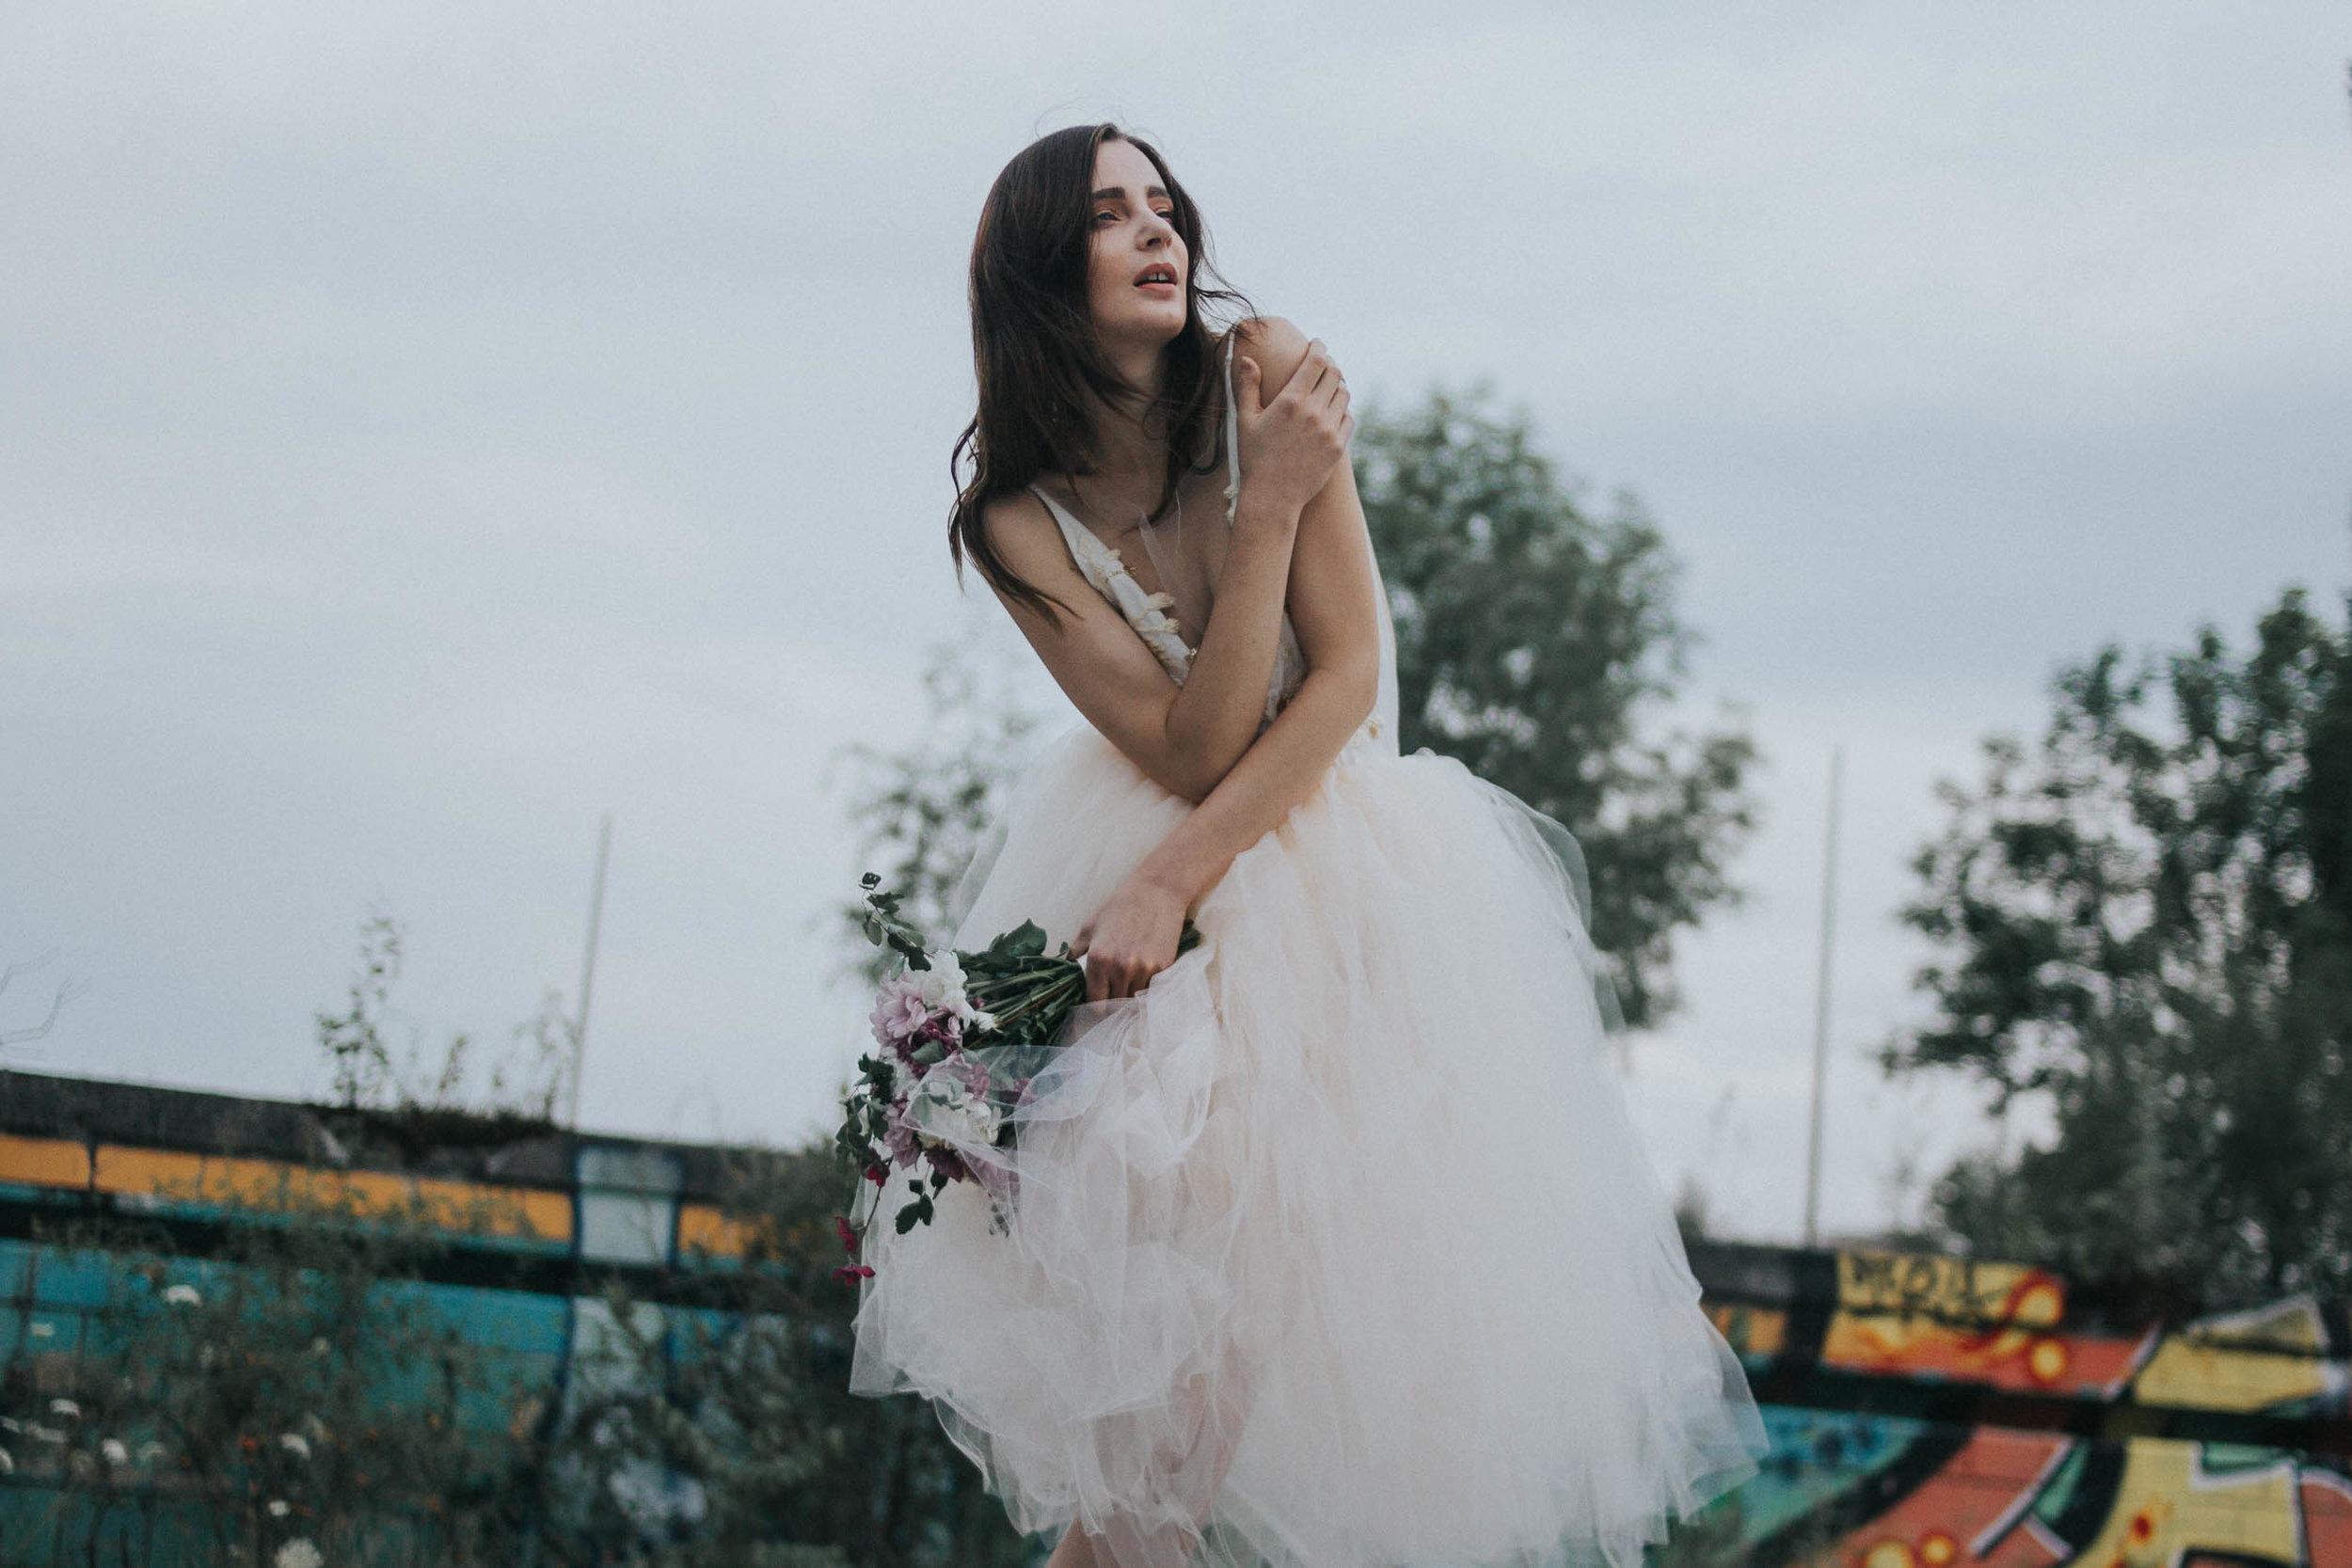 Model: Teresa Peitz  @teresa_peitz   Dress: Clara Eckoldt  @claraeckoldt   Stylist:  @missheatherharlowe   Flower Stylist:  @stemsfromher